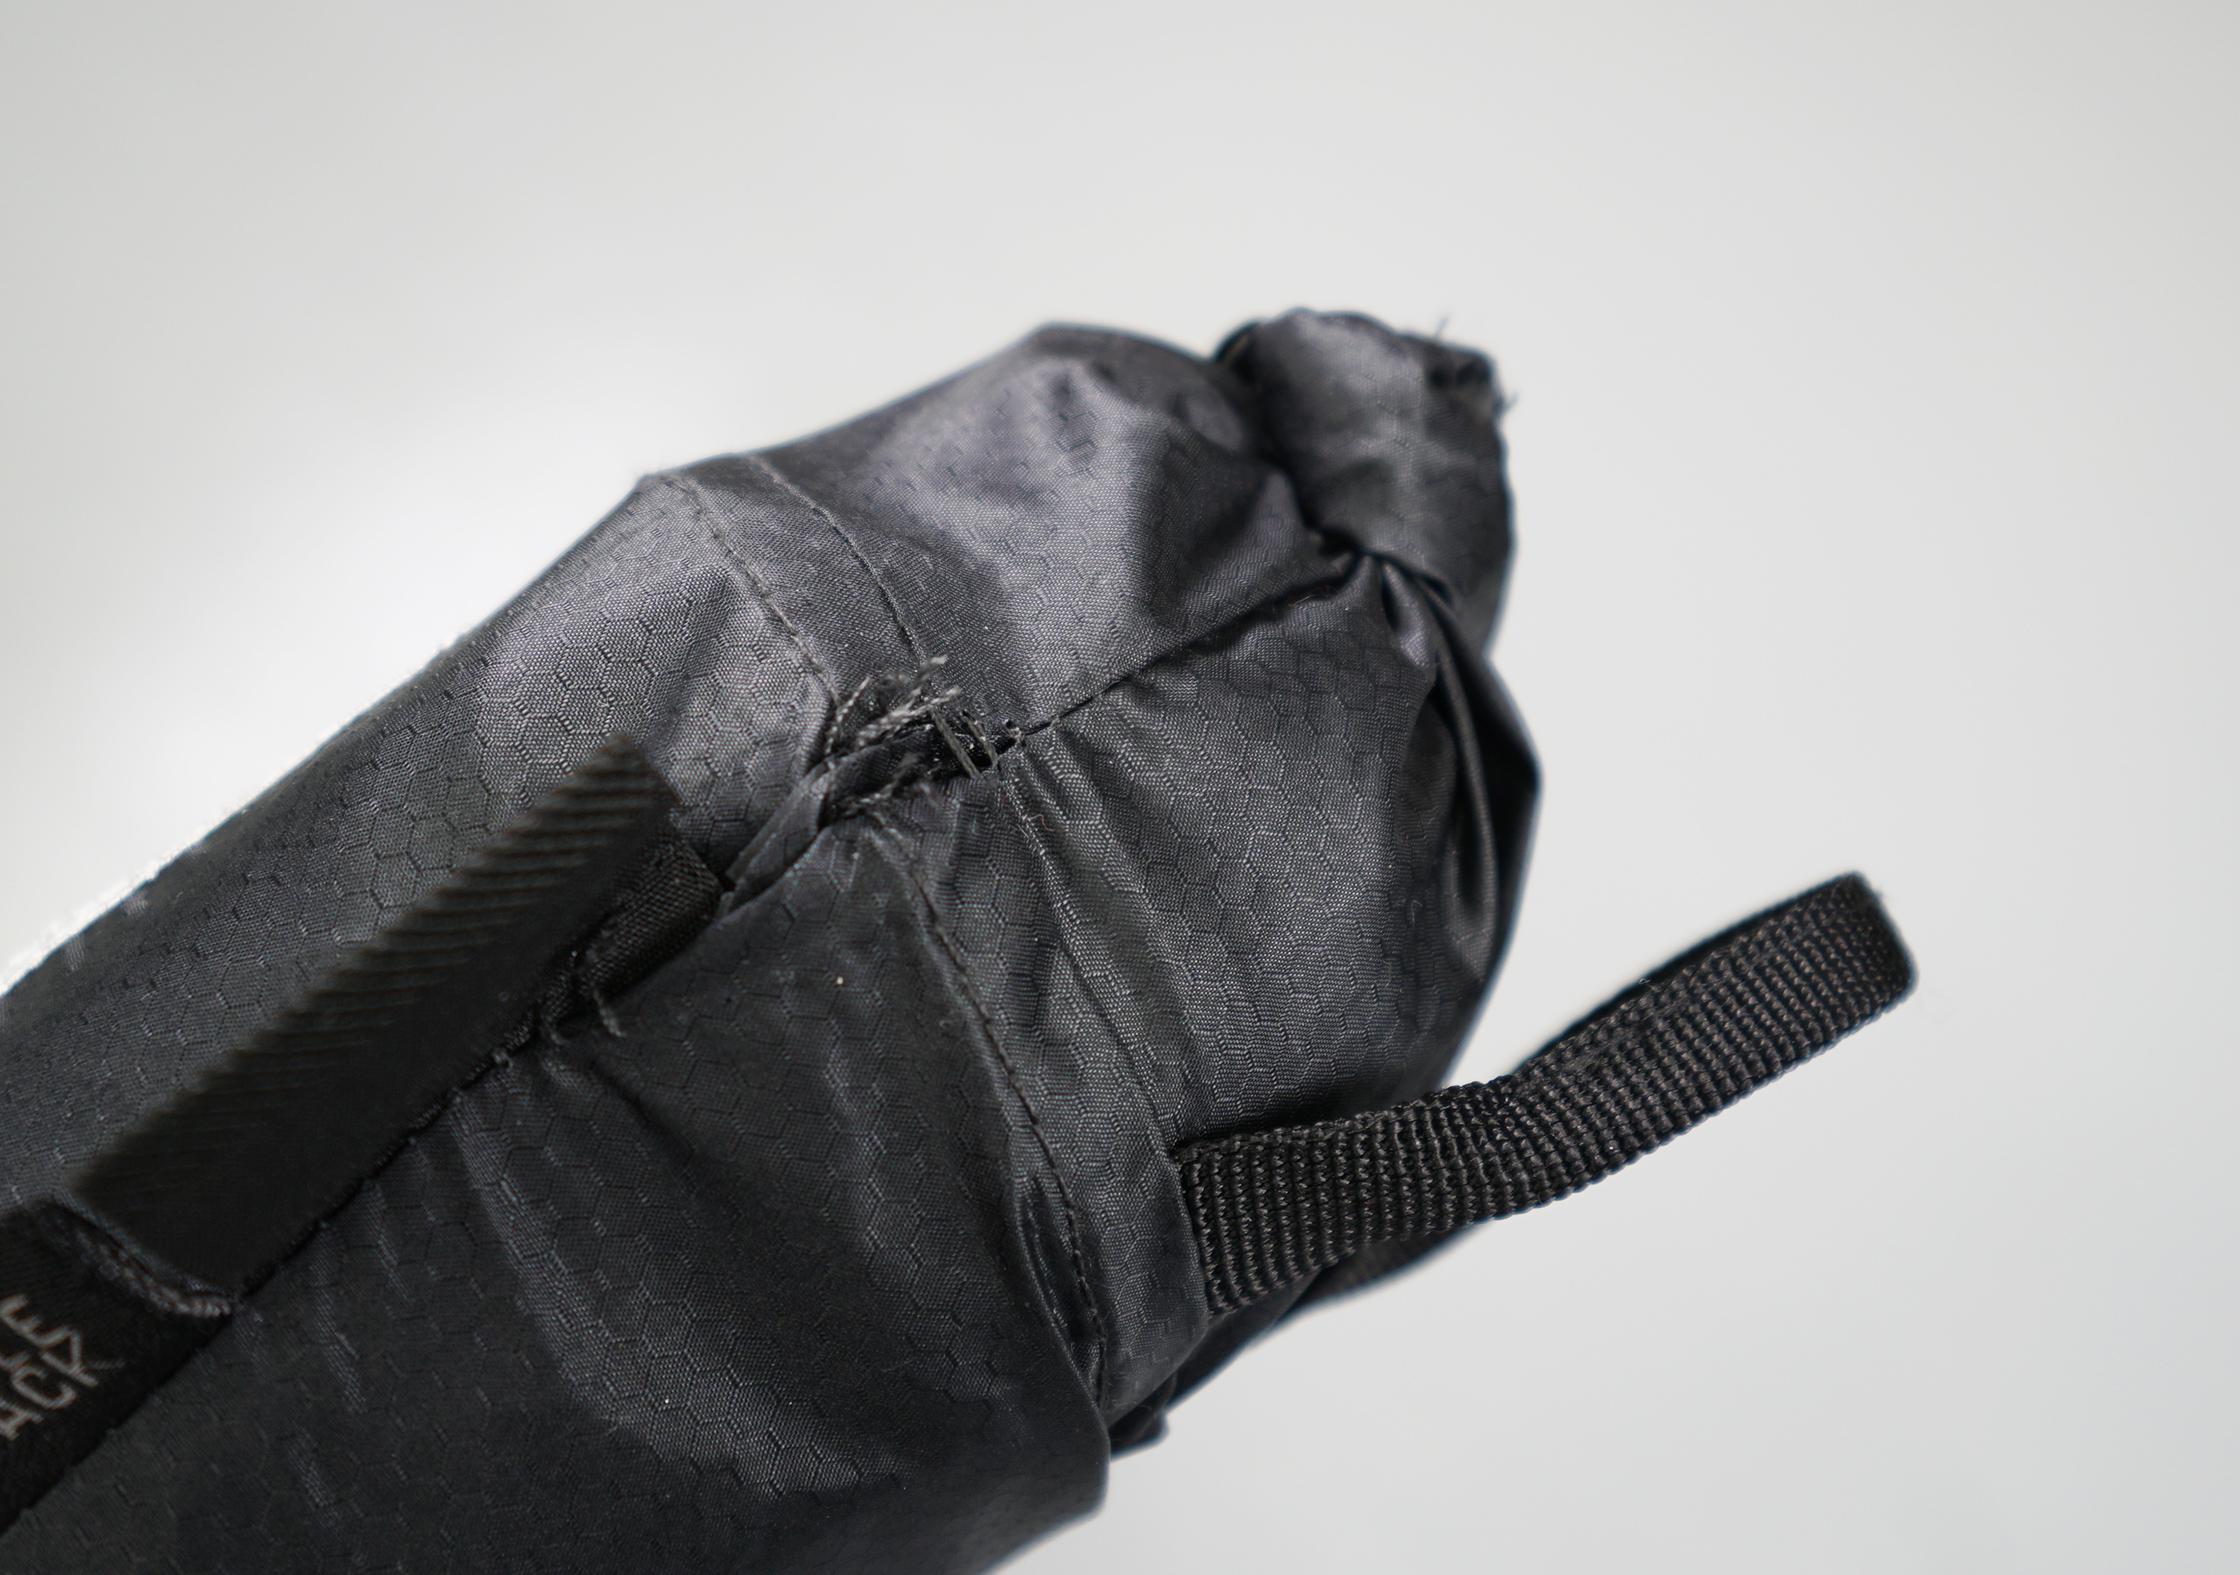 Matador Freefly16 Daypack Stitching Coming Loose